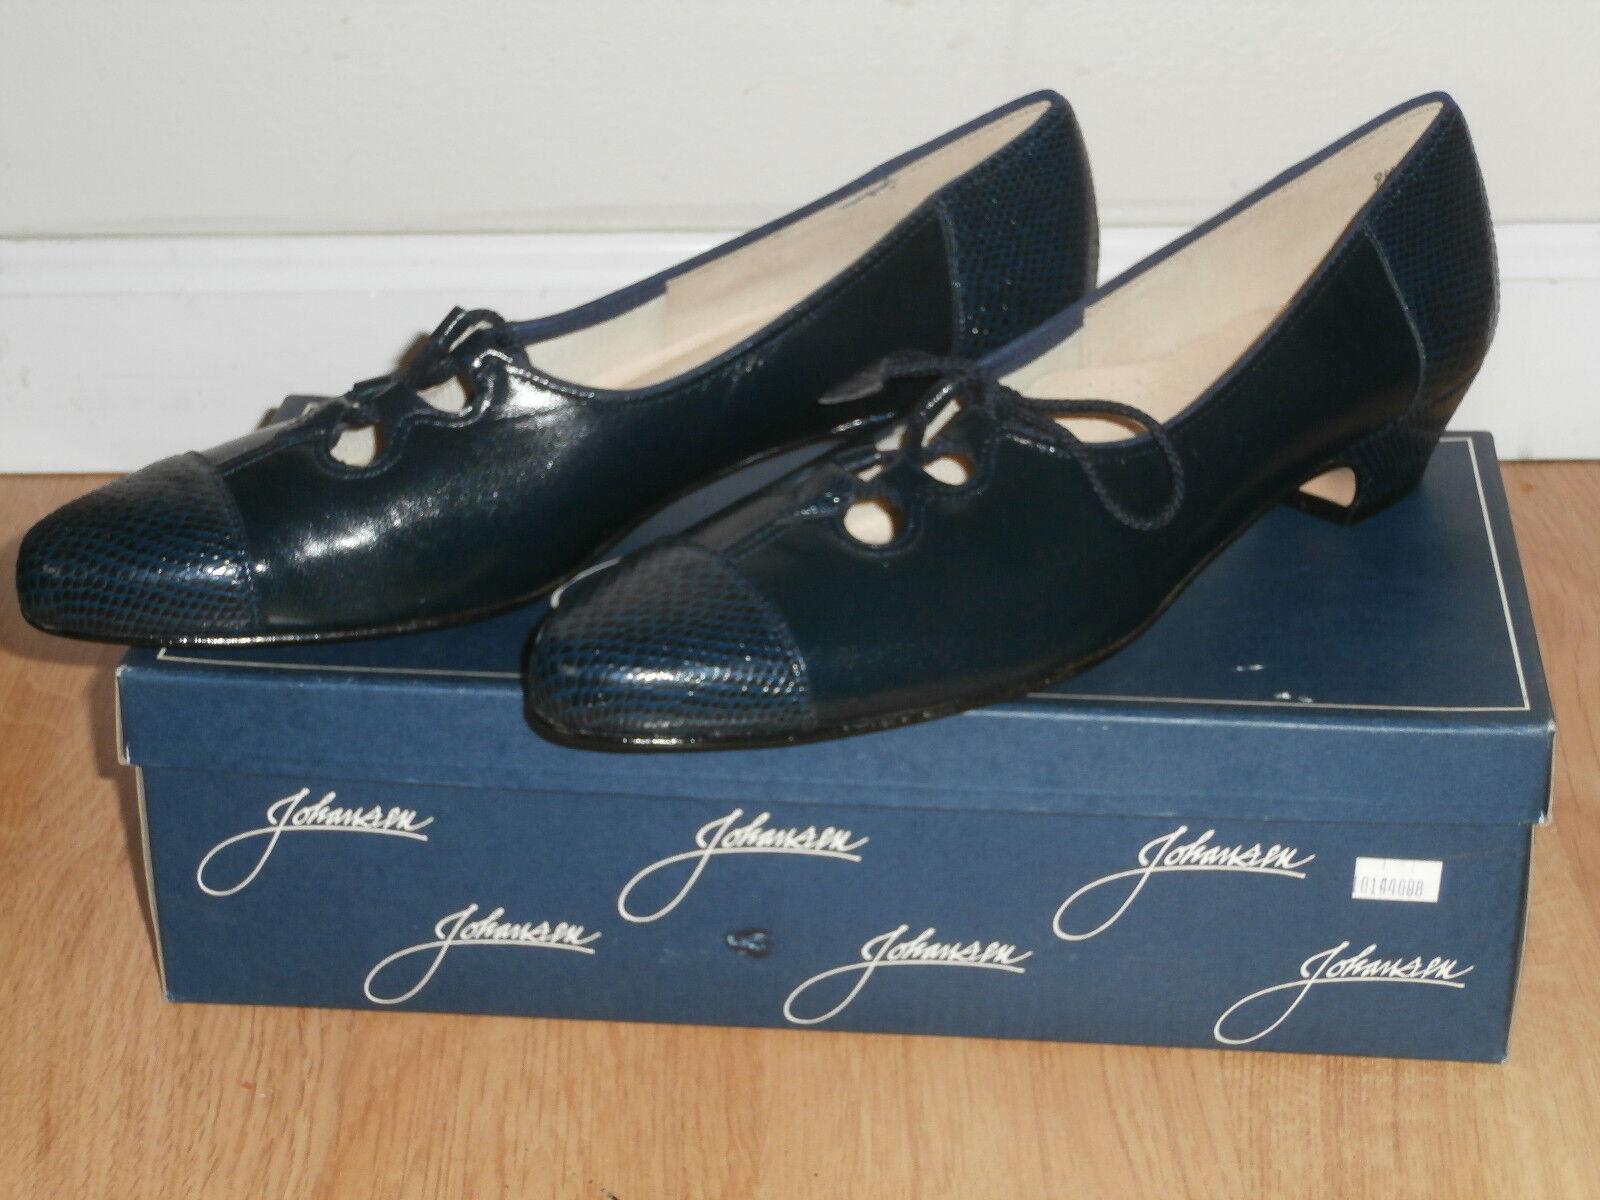 Johansen -Leather Cap Toe ,Low Heels, Size   9 9 9 1 2  5A ,color  Navy 8b9f0f